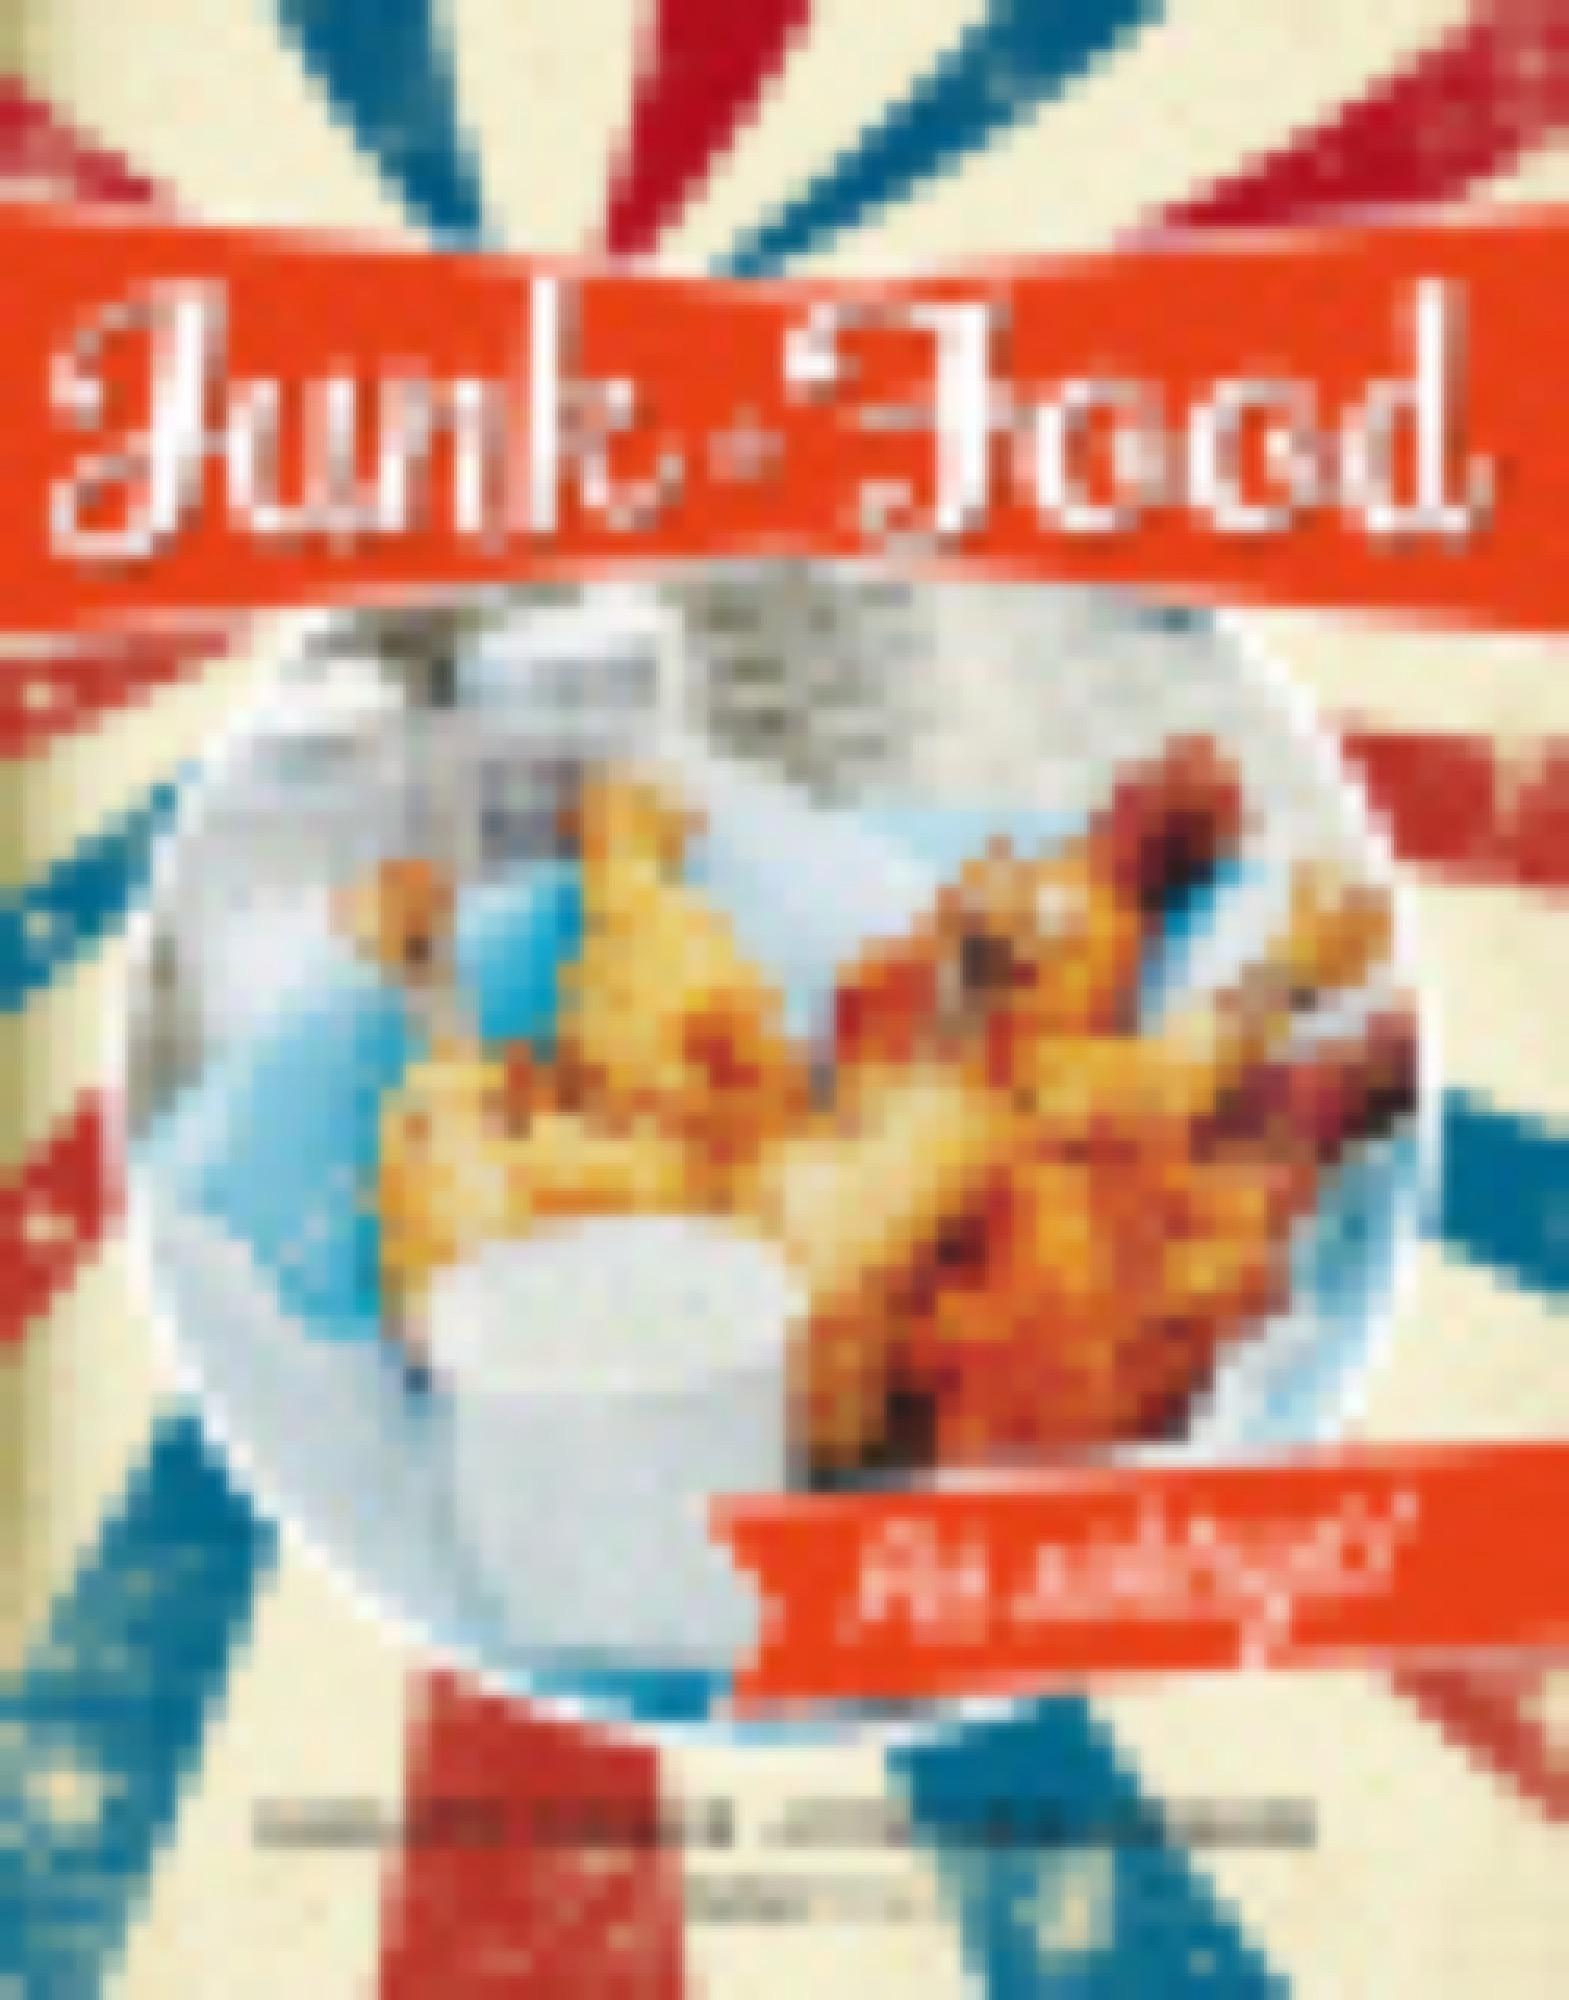 Junk Food, kakao förlag 2011